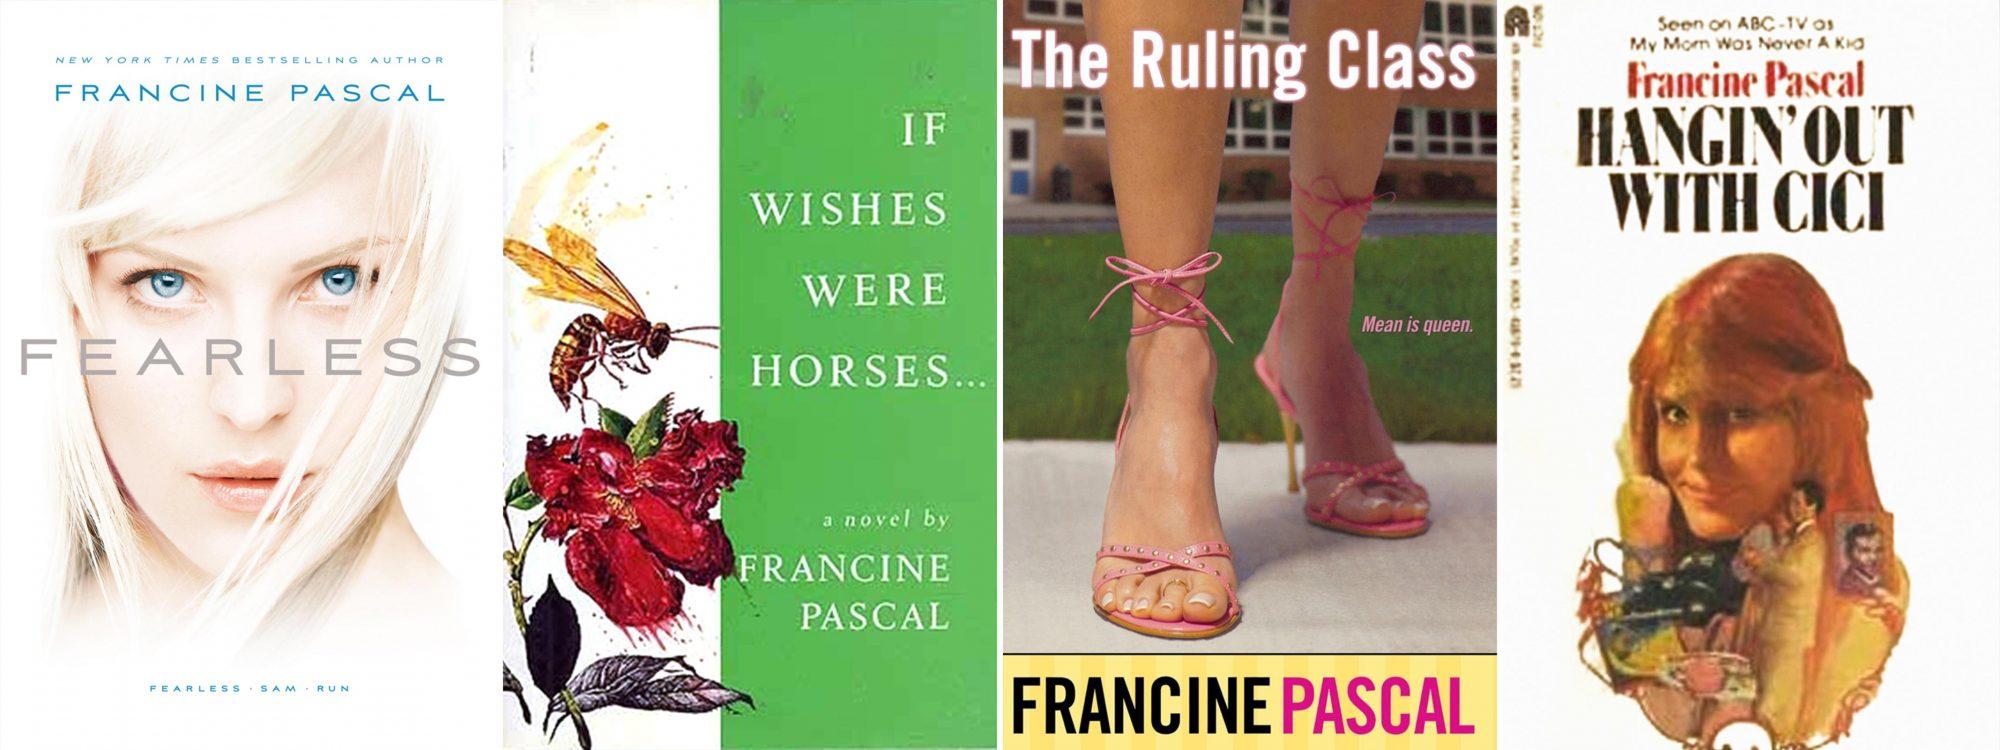 Francine Pascal novels